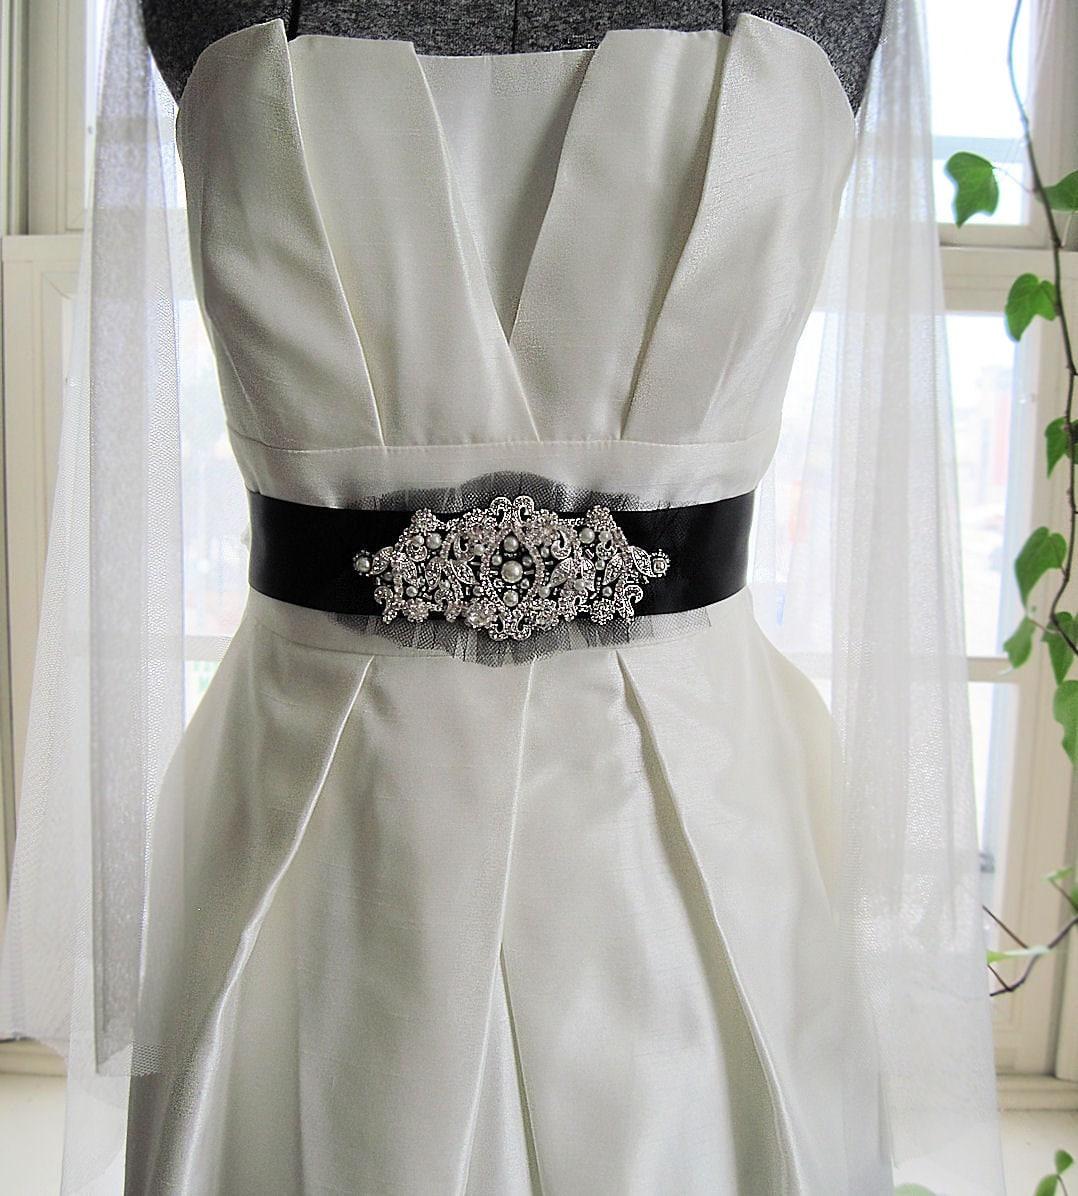 Rhinestone and Pearls bridal sash in black